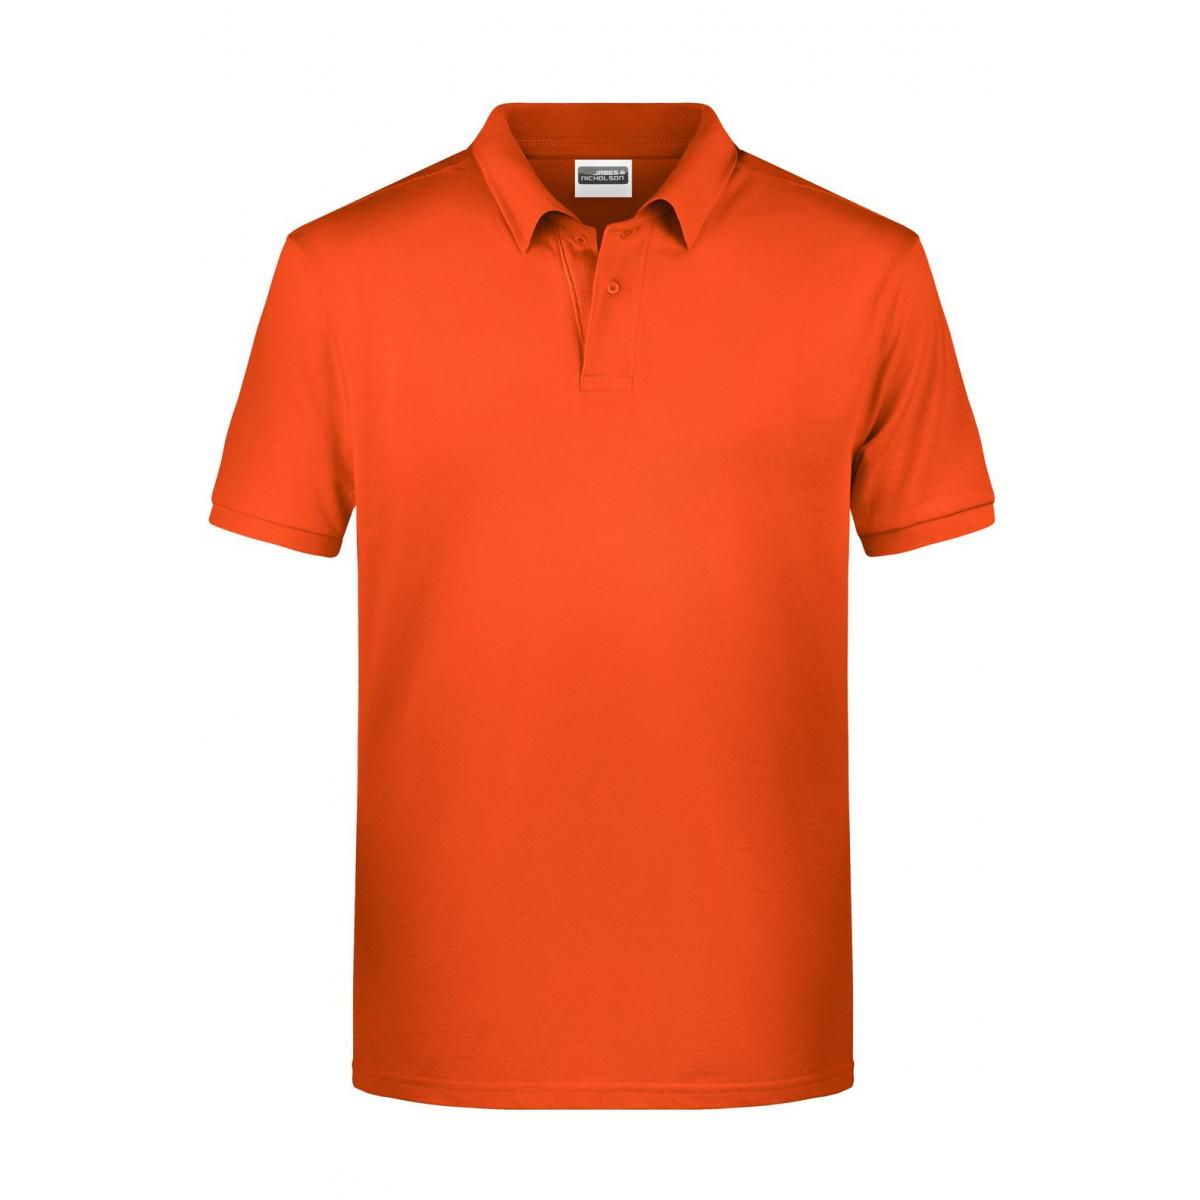 Рубашка поло мужская 8010 Mens Basic Polo - Темно-оранжевый